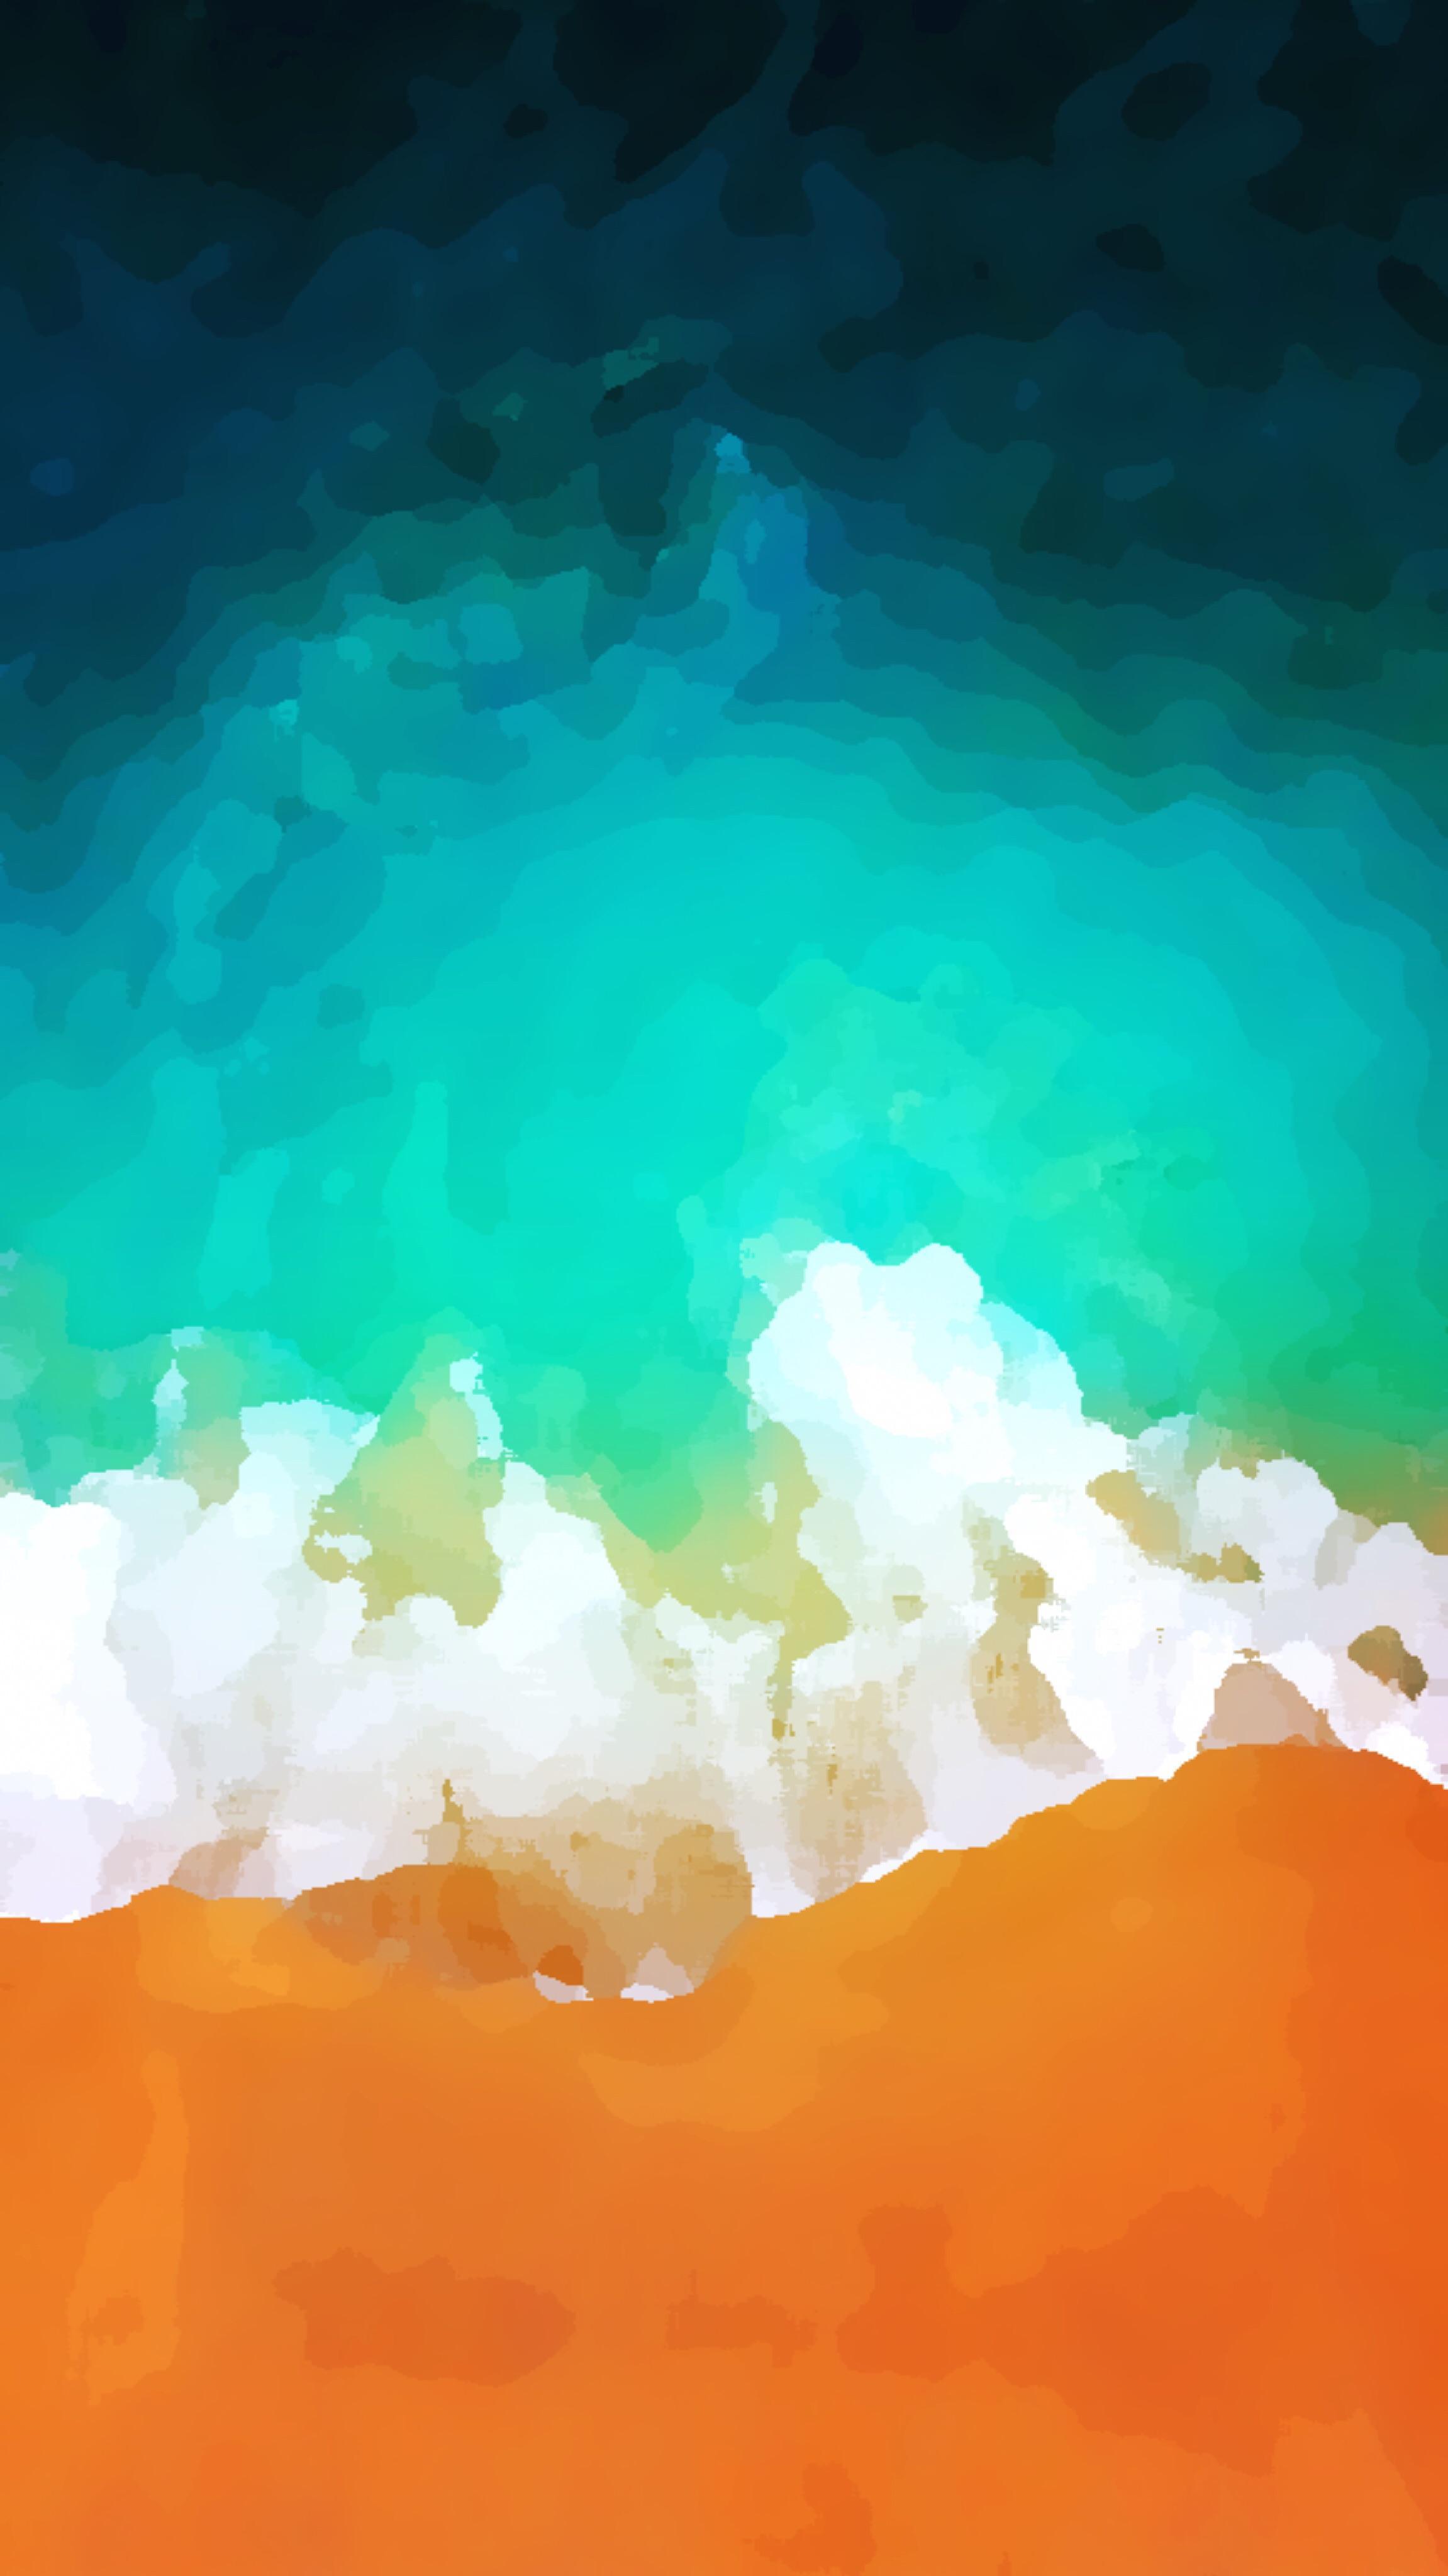 Full Hd Iphone Wallpaper Hd Original , HD Wallpaper & Backgrounds